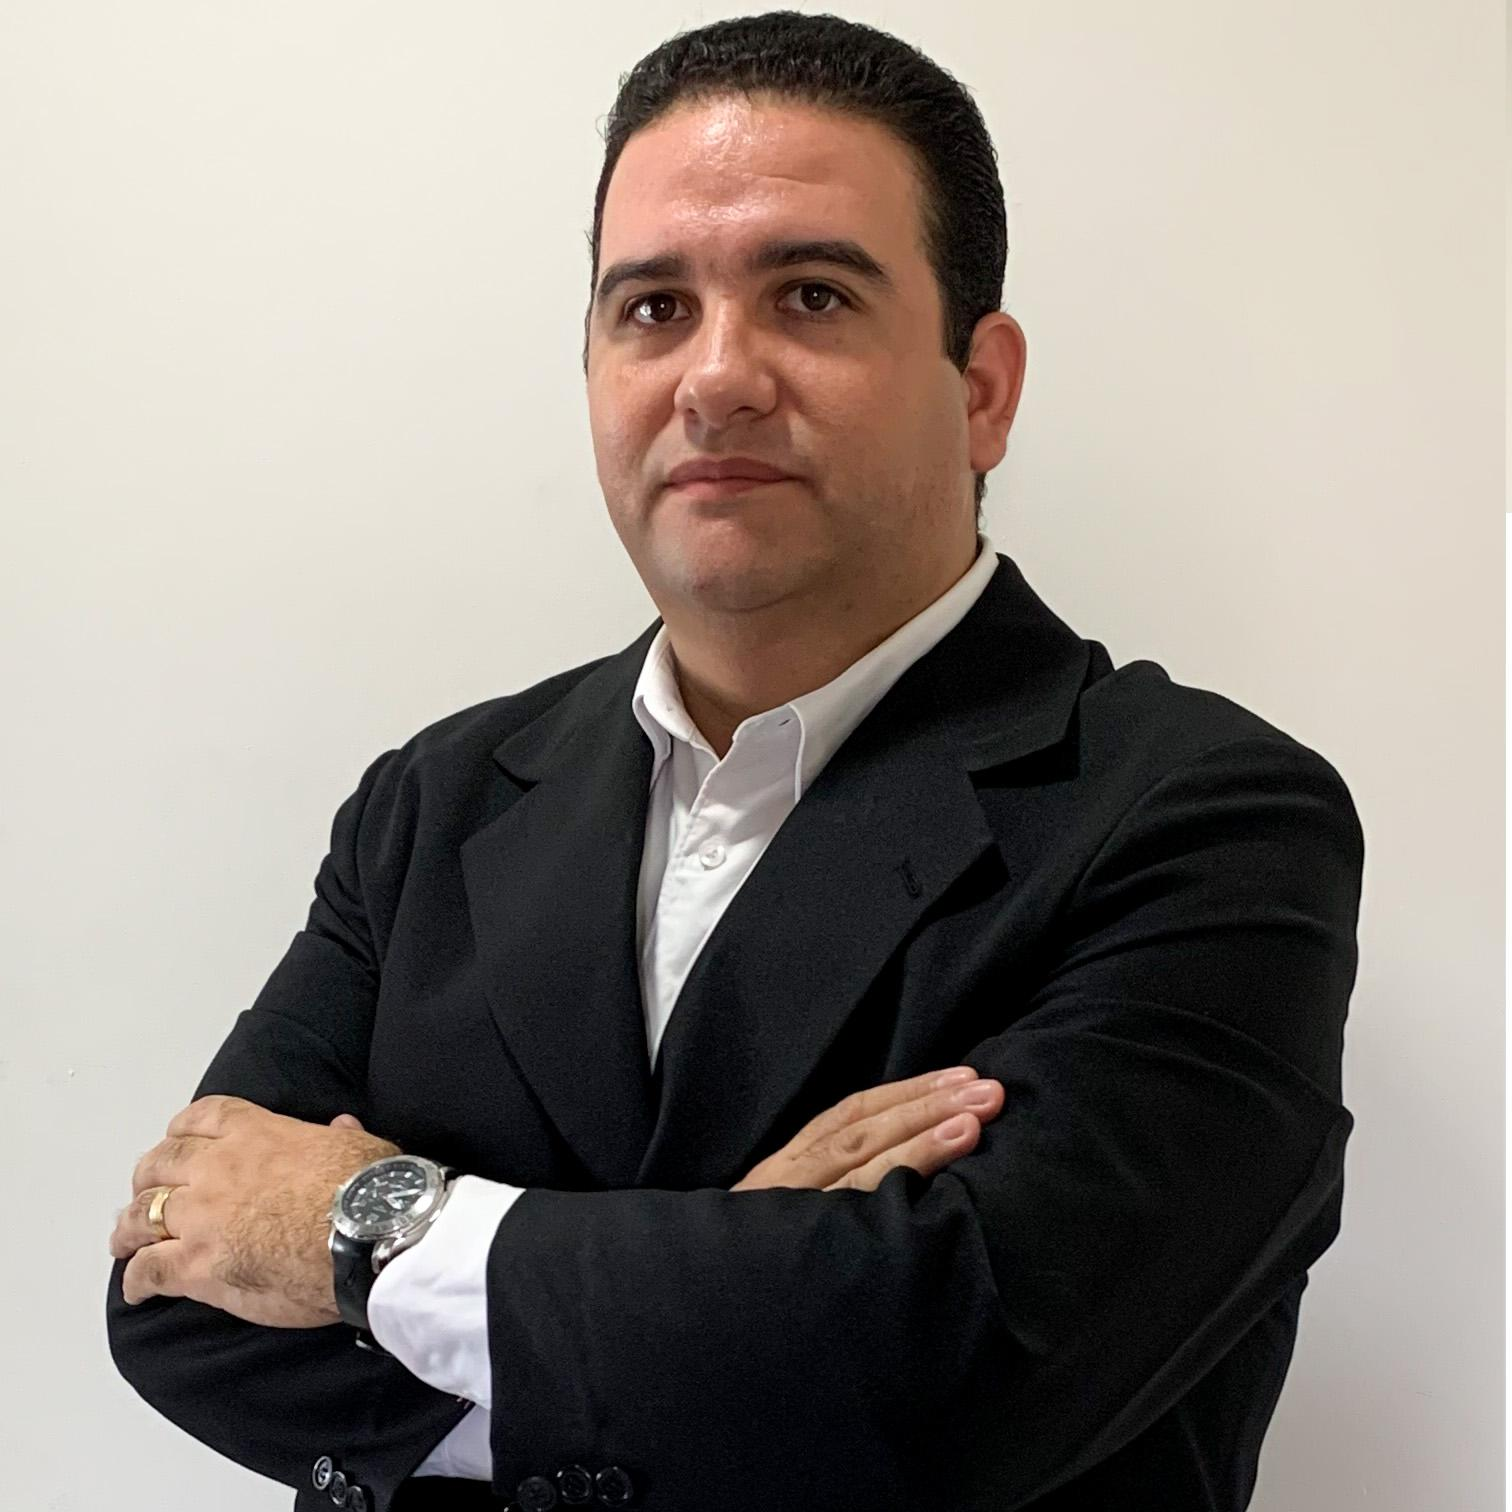 Marcilio Palmeira da Costa